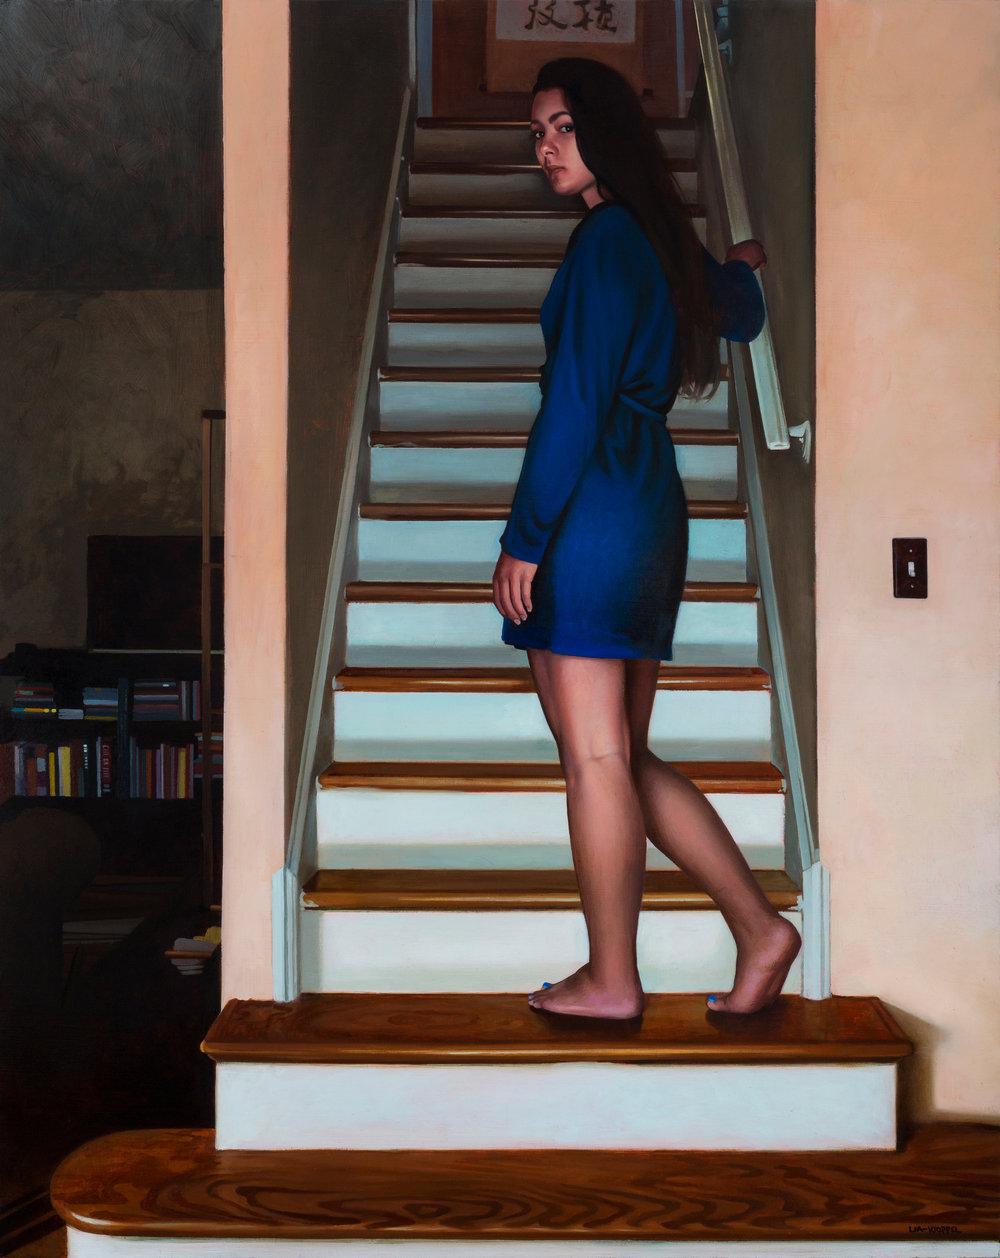 Susanna at the Dais,  2017, Oil on linen, 36 x 24 inches